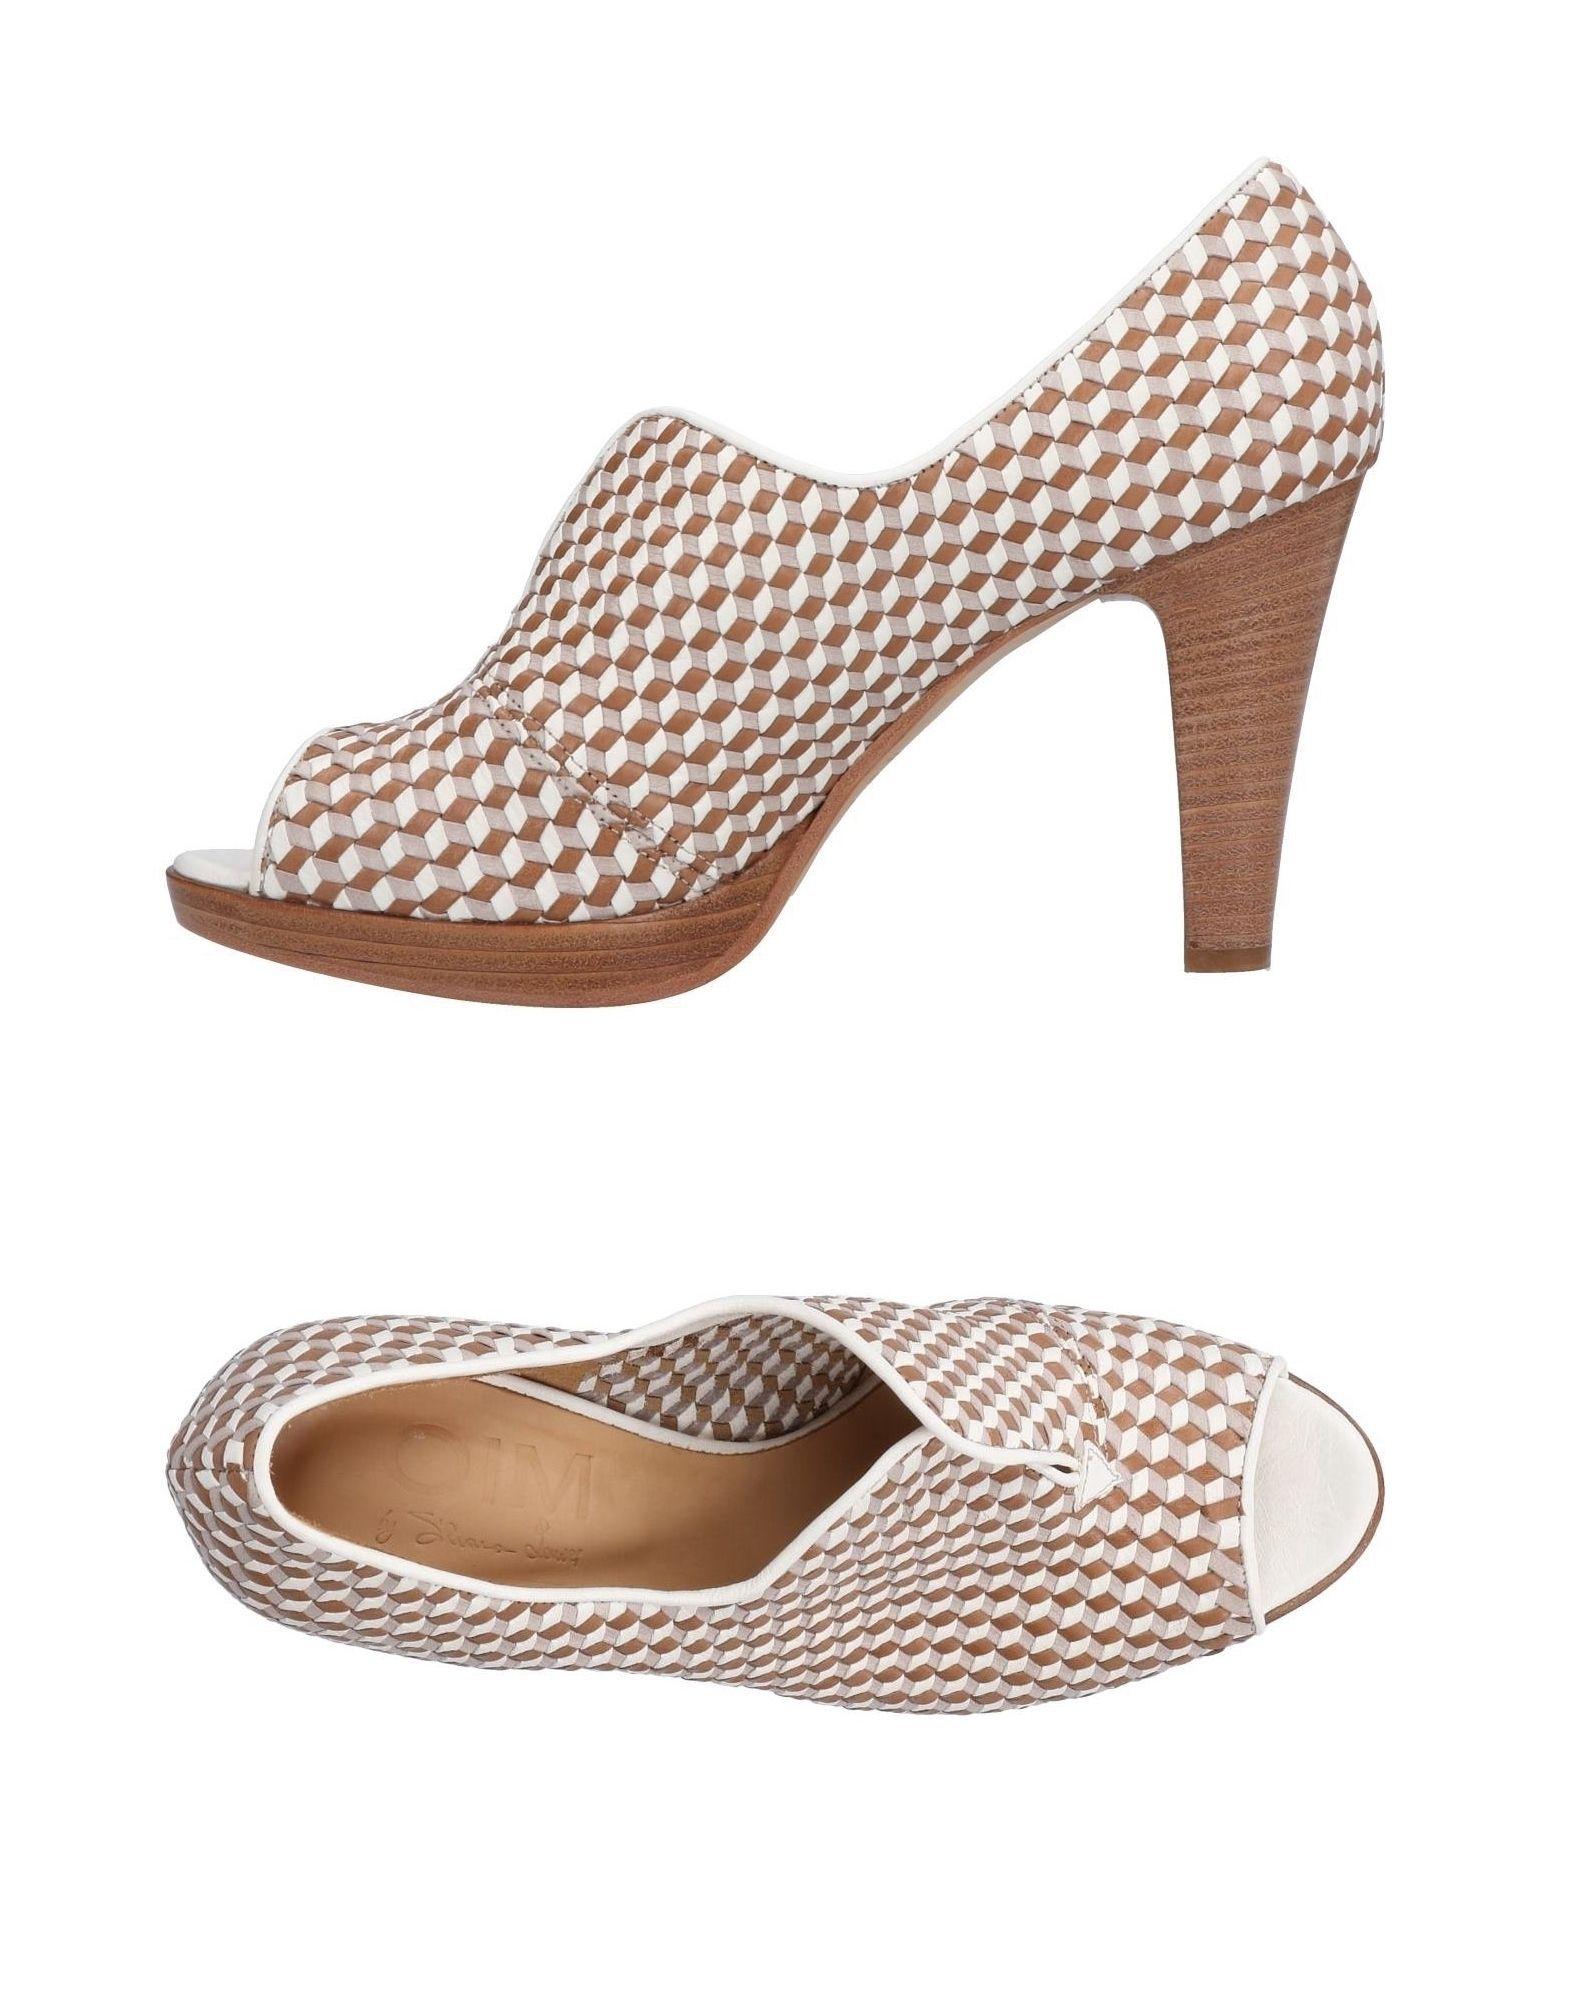 Stilvolle billige Schuhe Pumps Oim By Silvana Lauri Pumps Schuhe Damen  11504897DV bbbf49